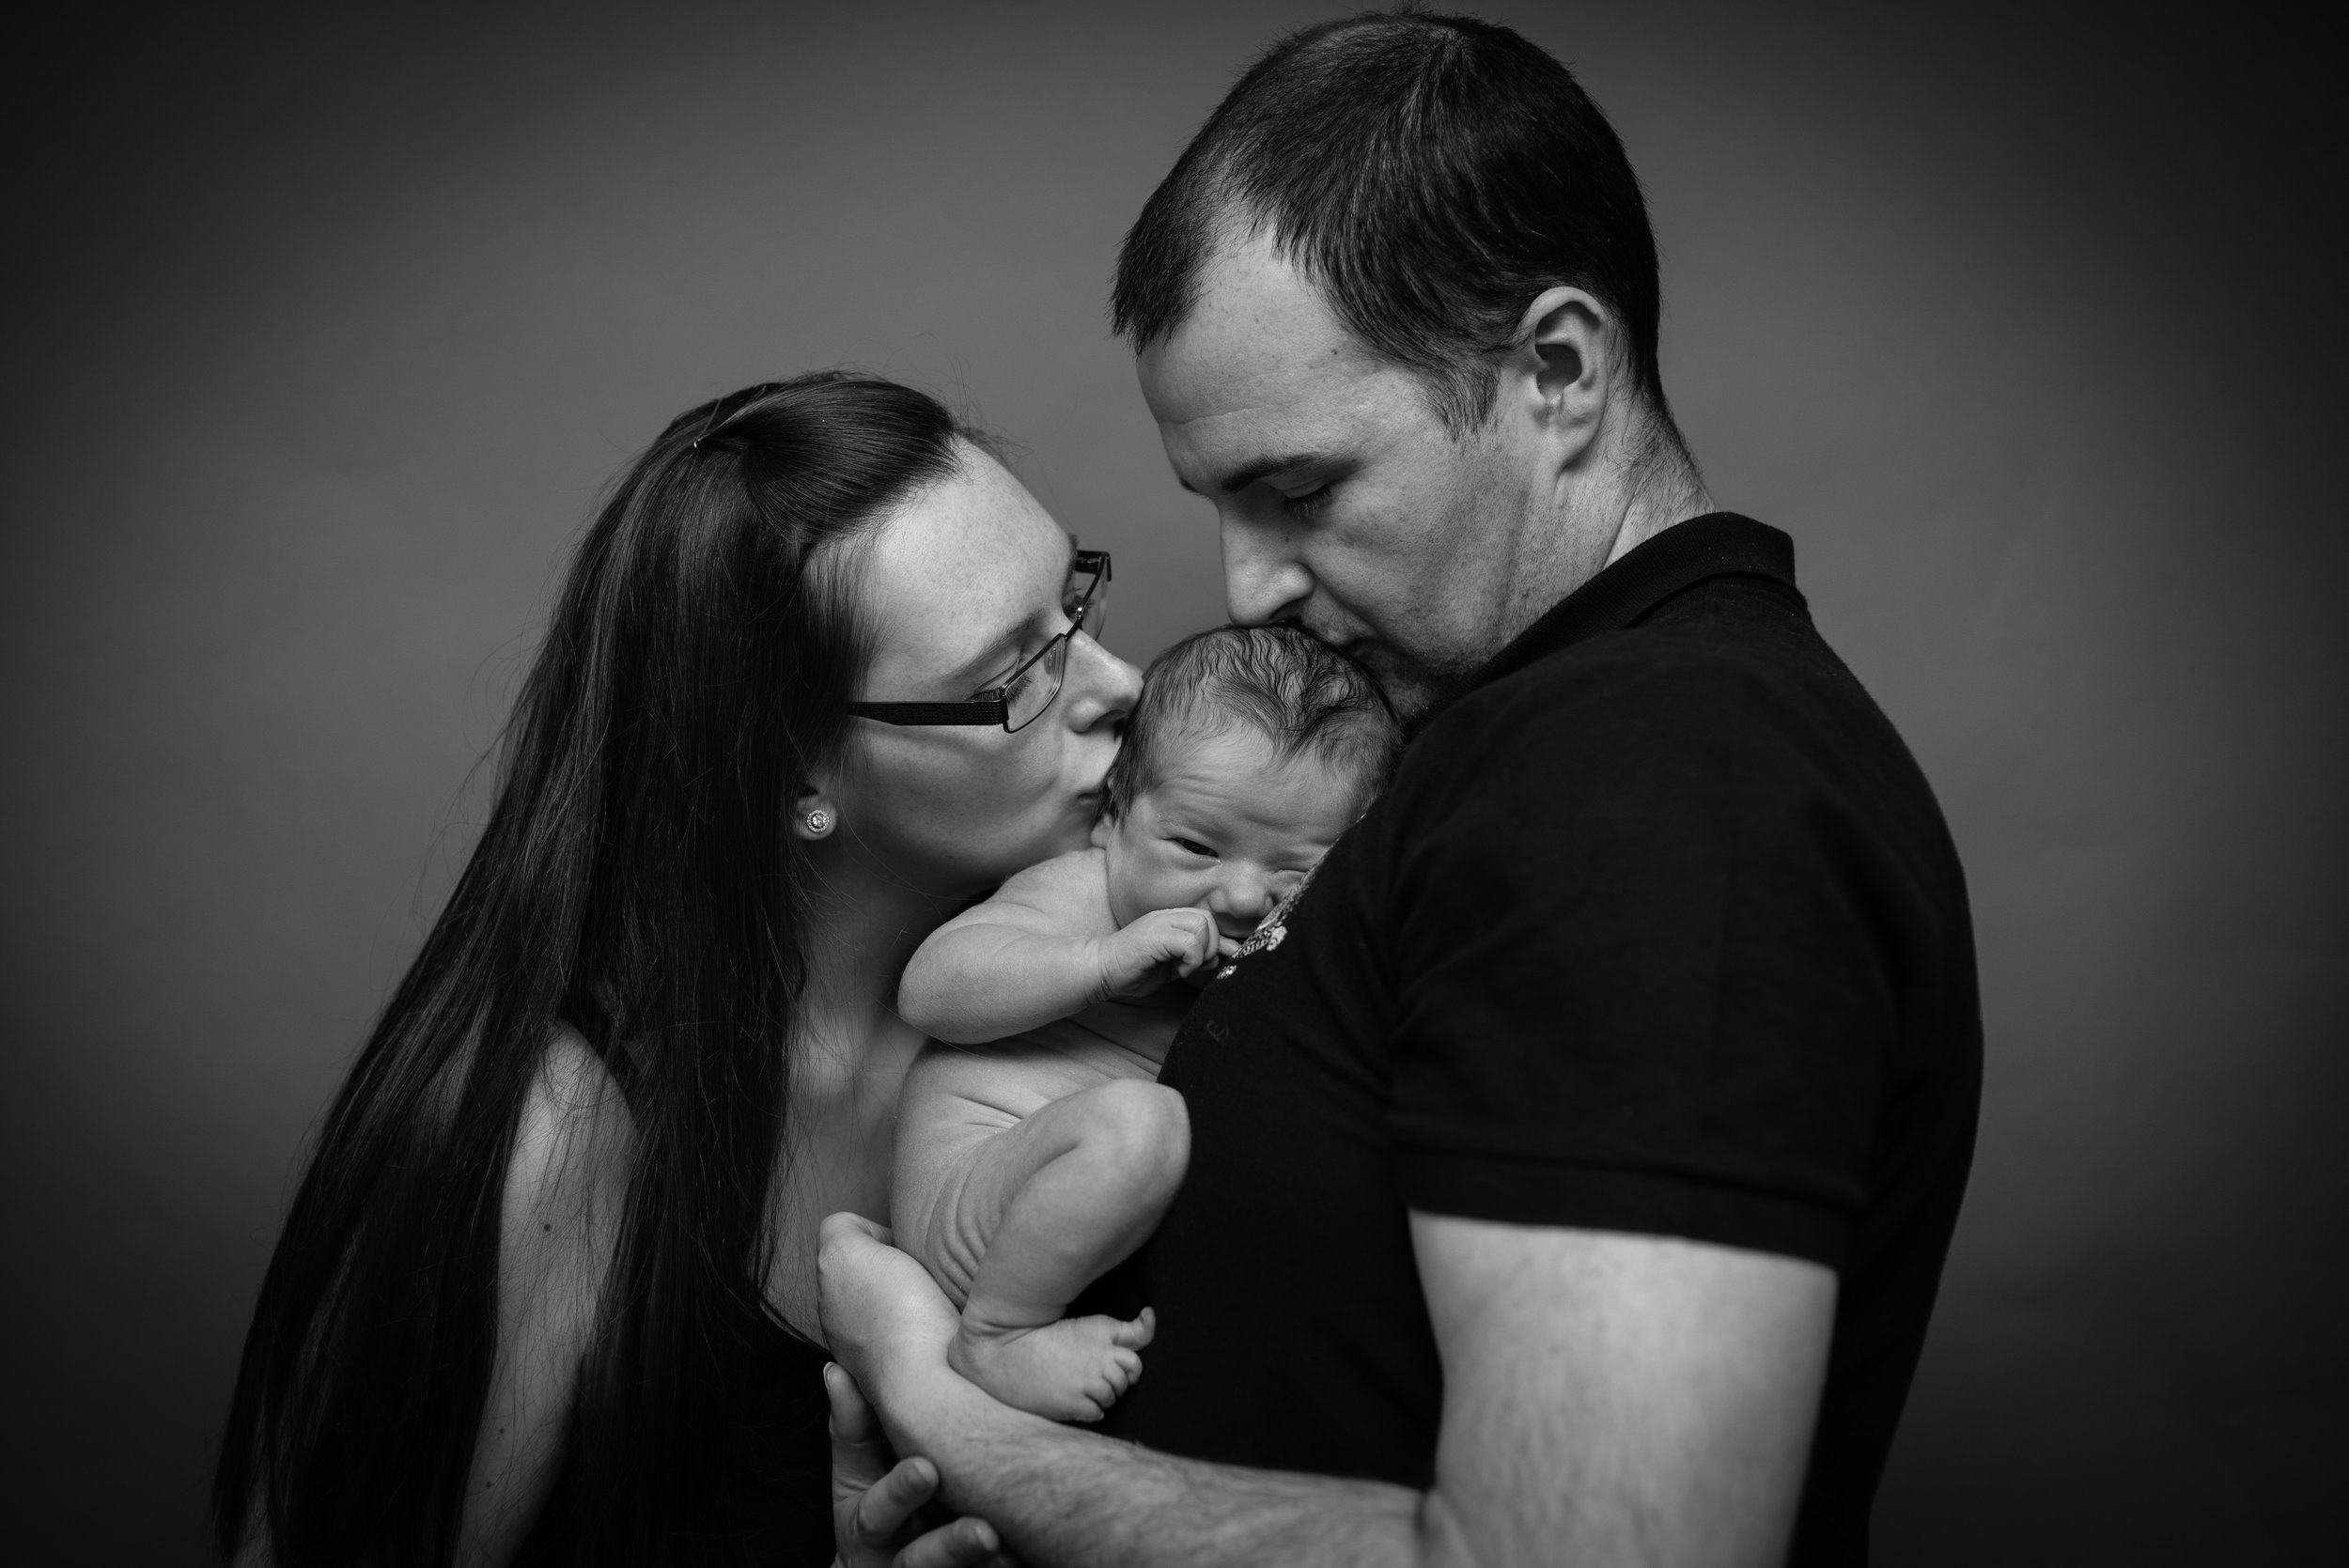 Lancashire newborn photo session